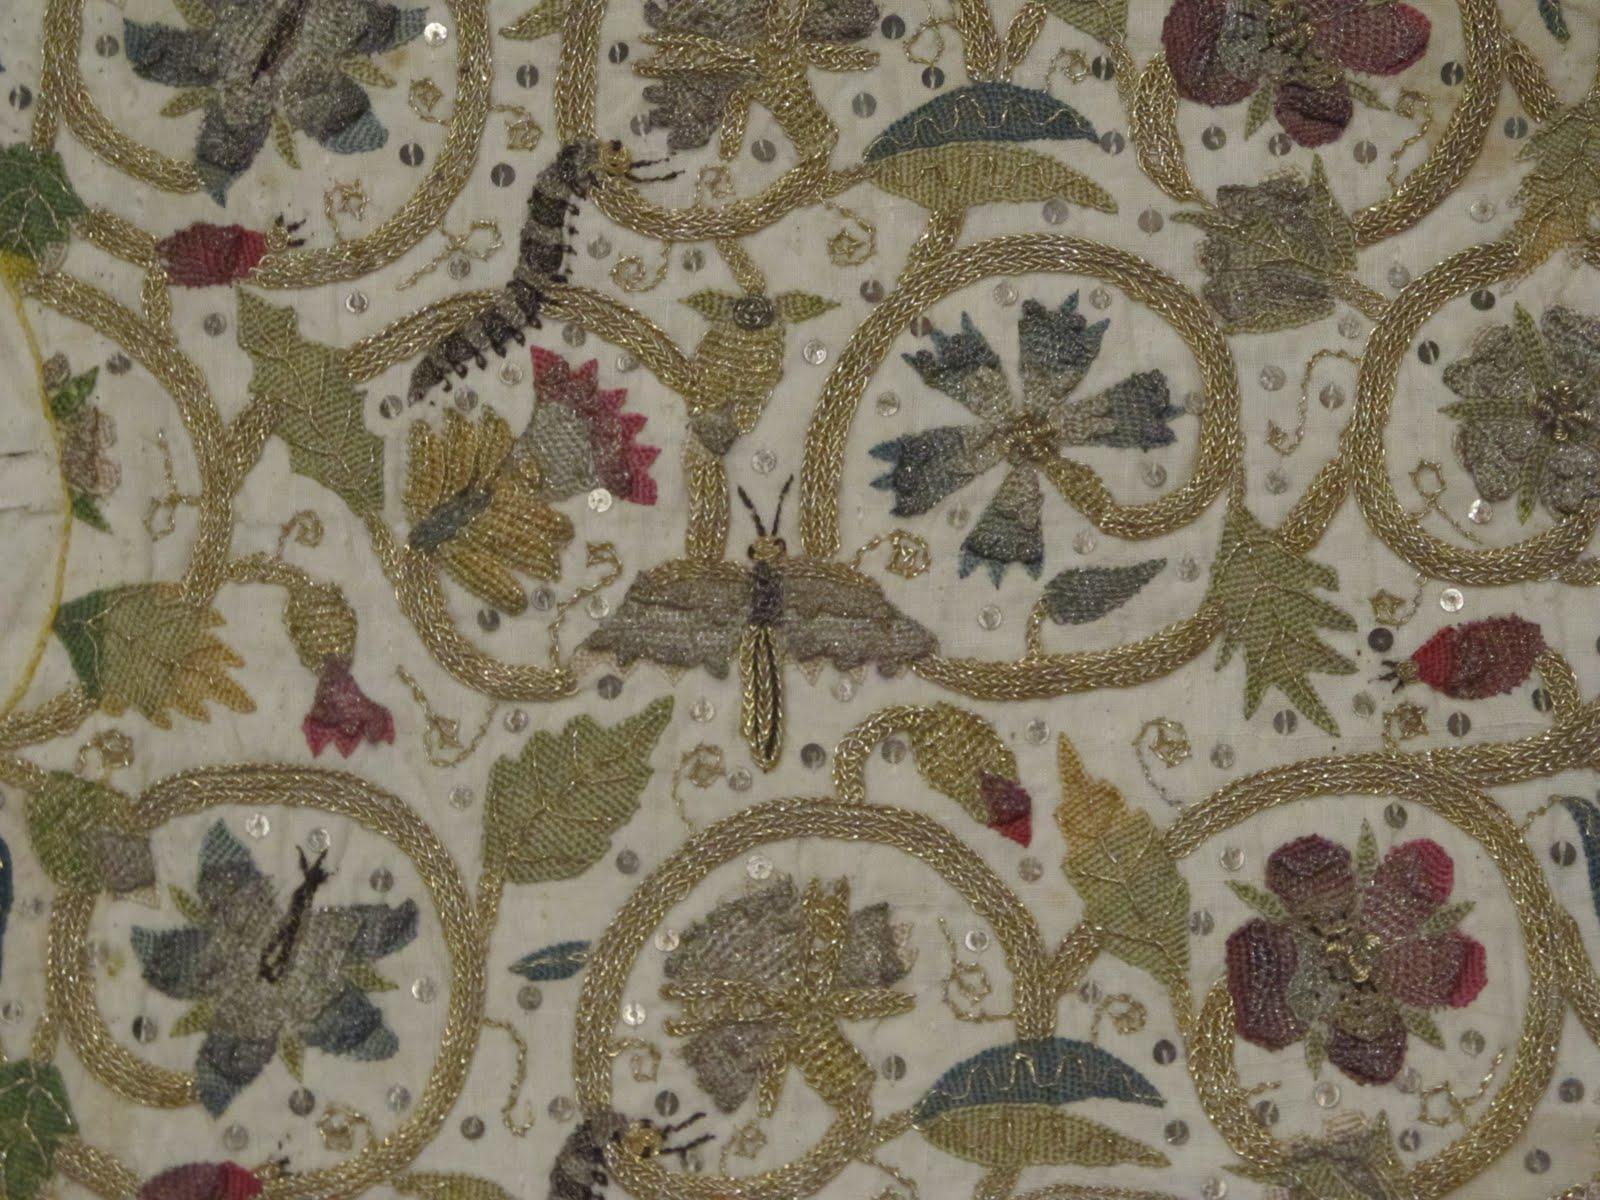 Baroque Embellishments Threaded Adornment Four Centuries